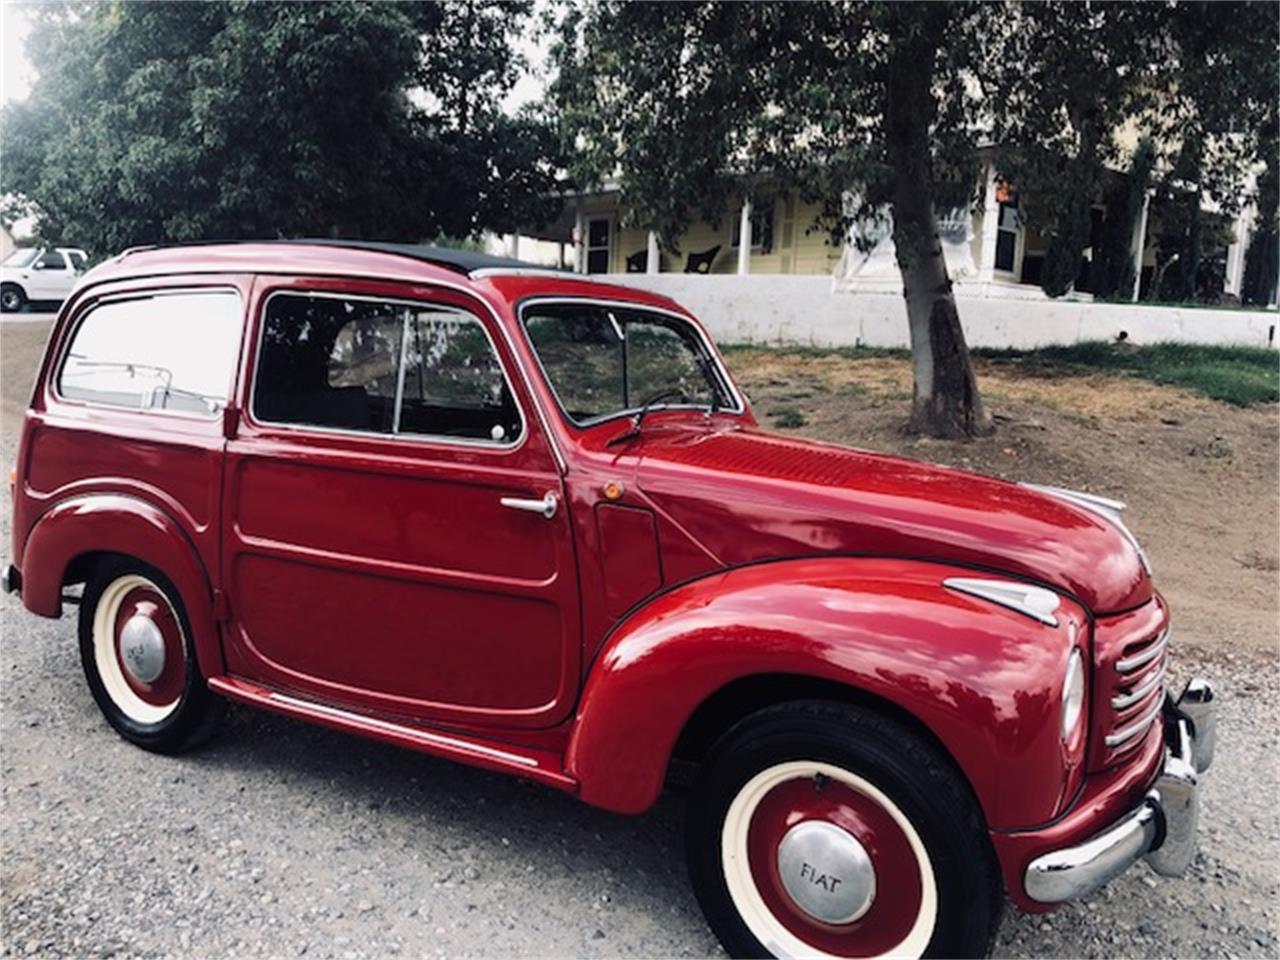 Fiat Of Palm Springs >> 1953 Fiat Topolino For Sale Classiccars Com Cc 1153447